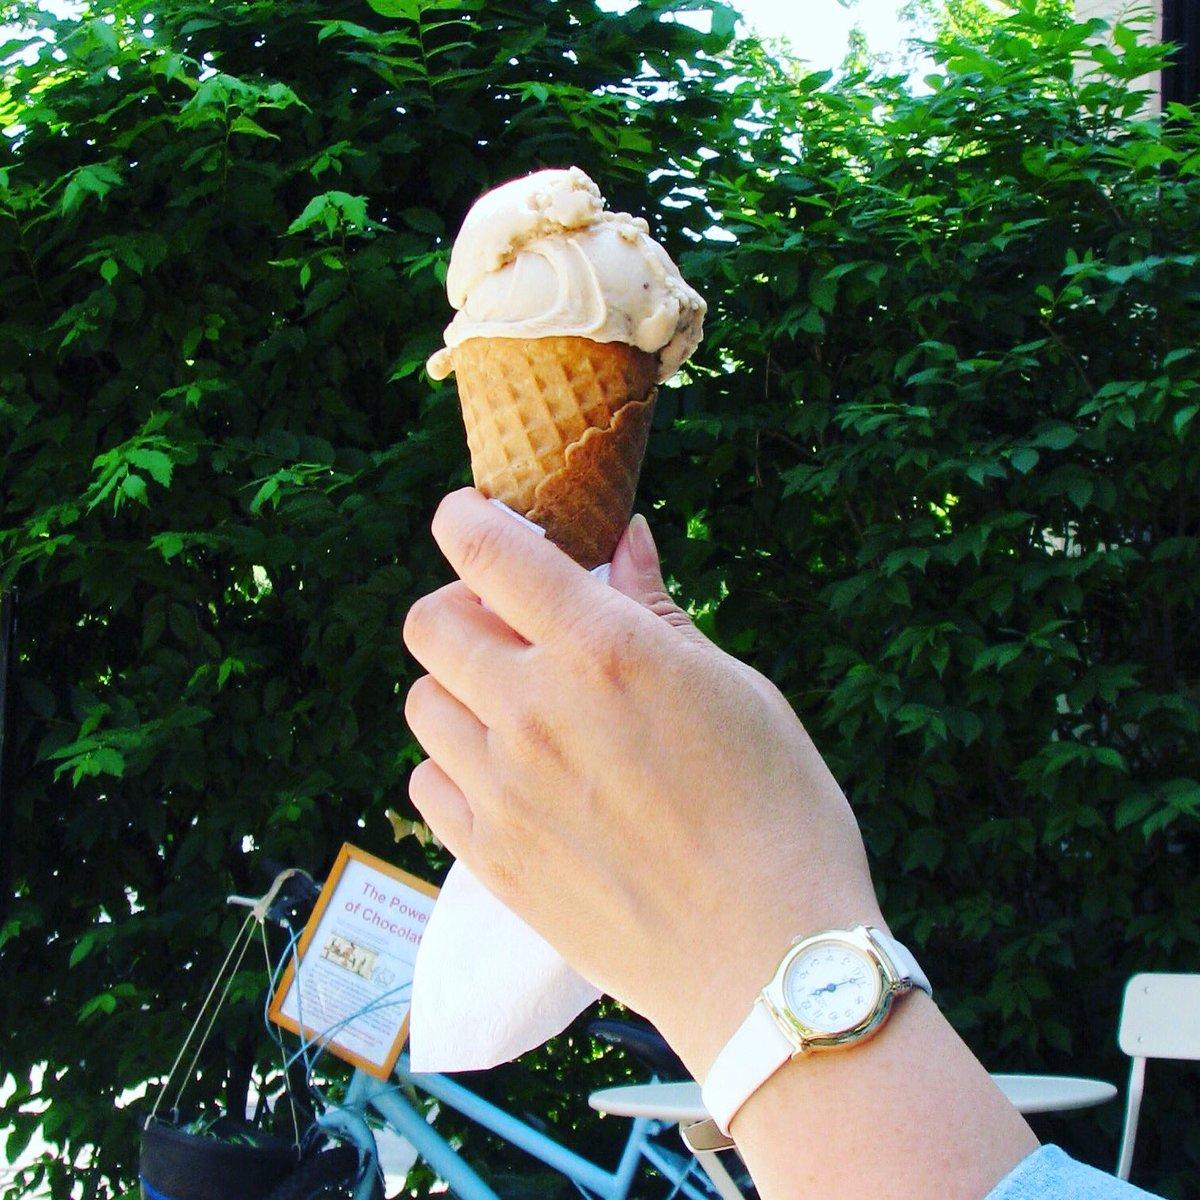 Summer Treat: Free Gelato at Weekends for children under 14 only at Leonidas Culture Chocolat @leonidasculture #leonidasculture #chocolate #mtl #westmount #montreal #gelato #icecream #icedcoffee #chocolaterie